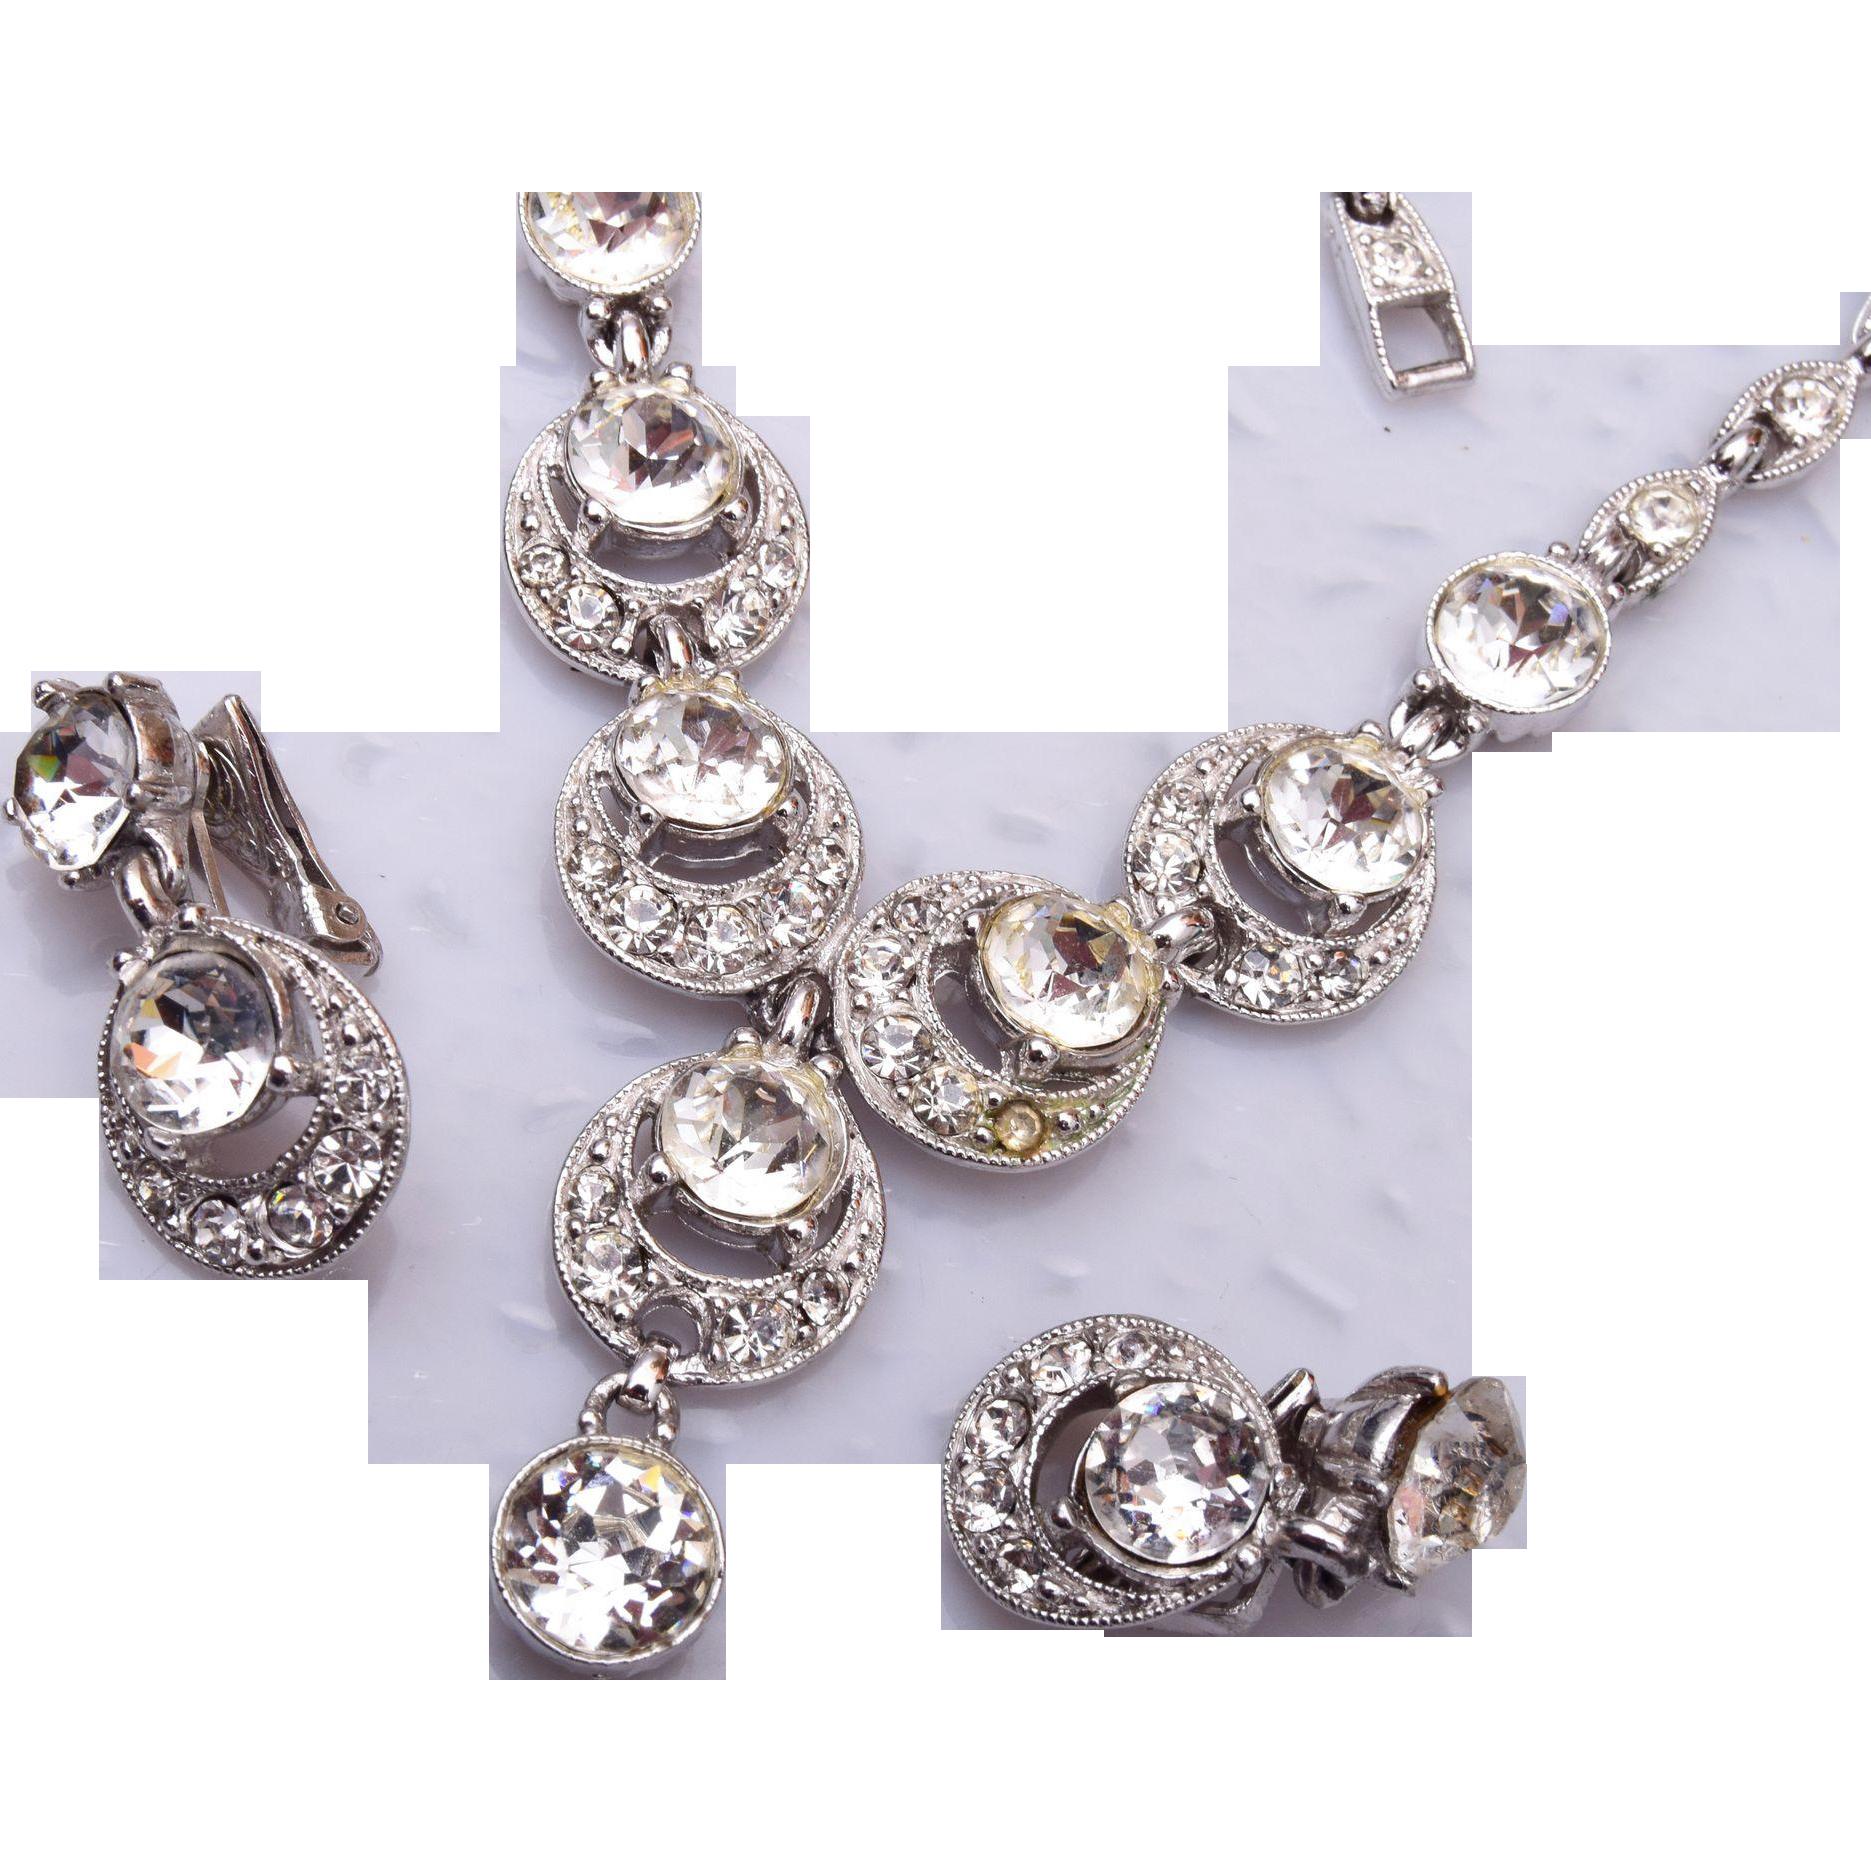 Bogoff Brilliant Rhinestone Necklace and Earring Set